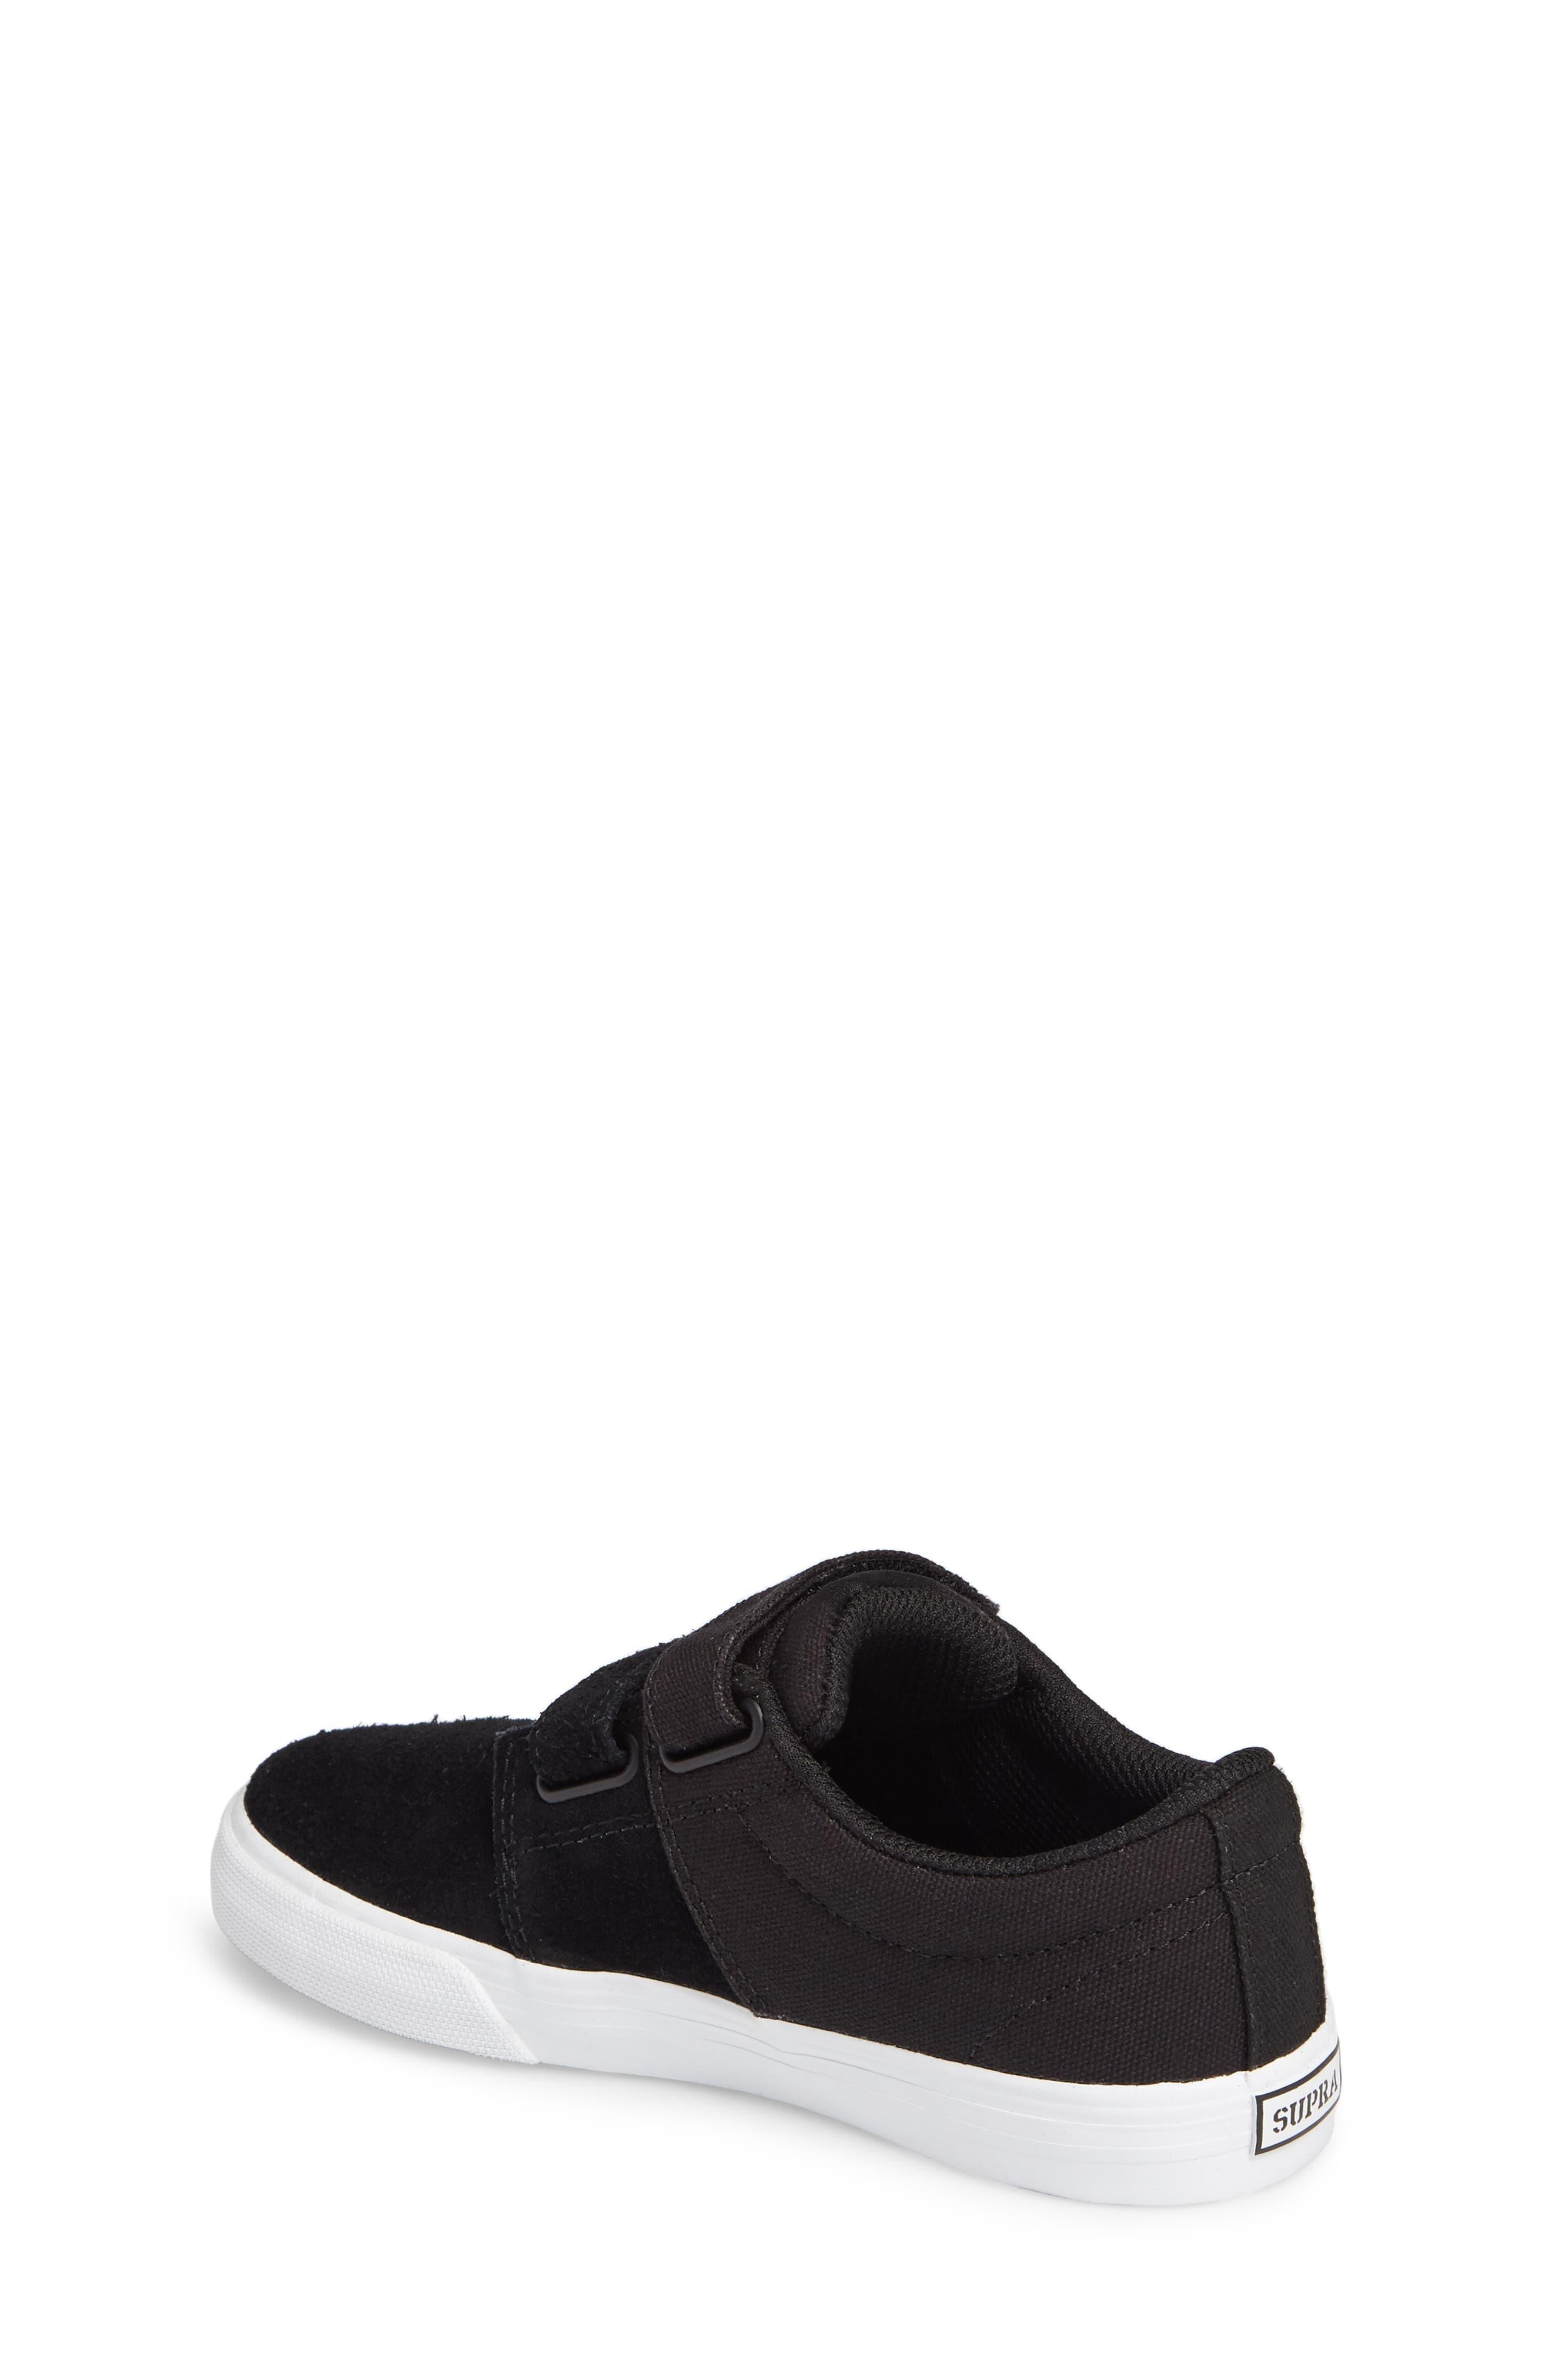 Stacks Low Top Sneaker,                             Alternate thumbnail 2, color,                             BLACK - WHITE